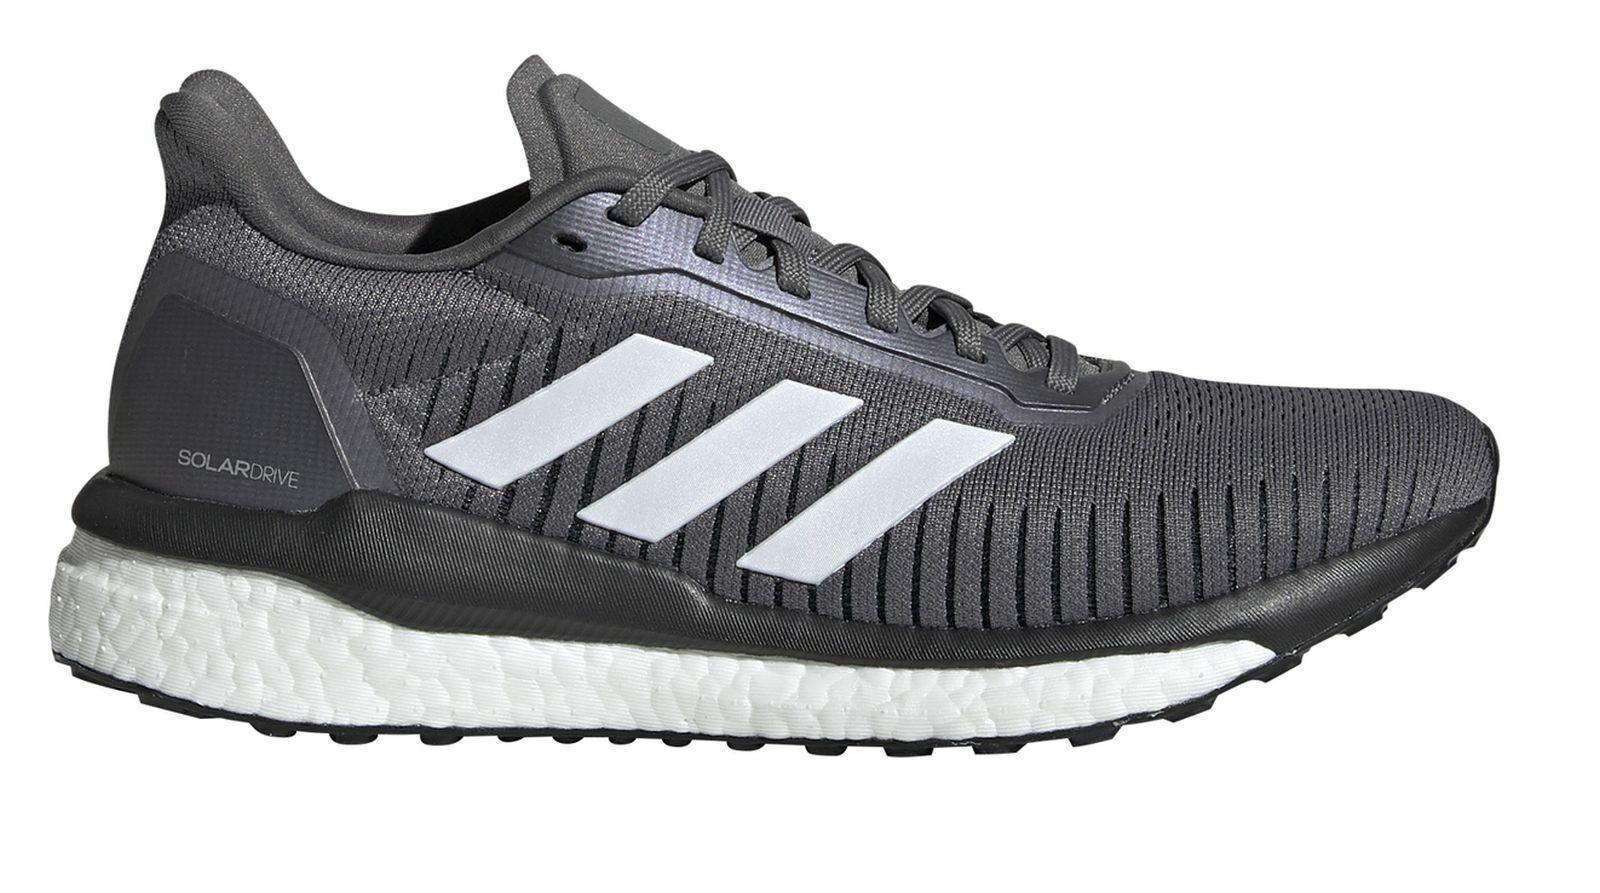 Adidas performance women  running shoe solar drive 19 w grey  best service